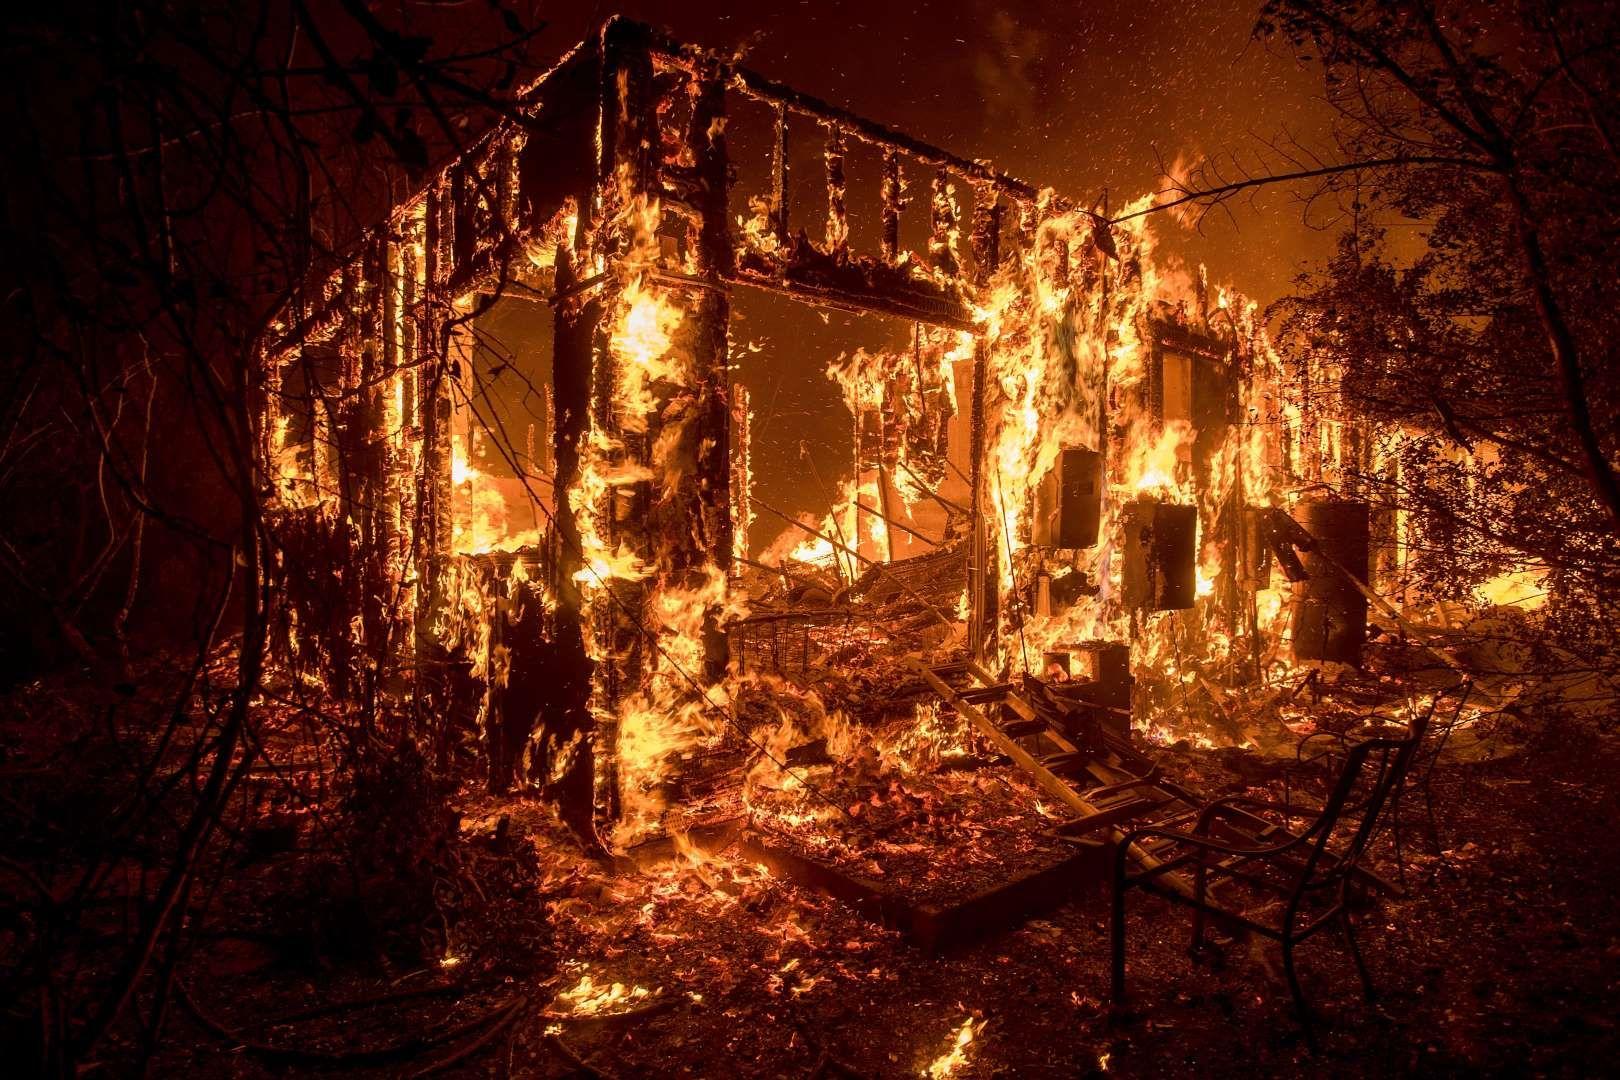 California Wildfires December 7 2017 Flames consume a home as a